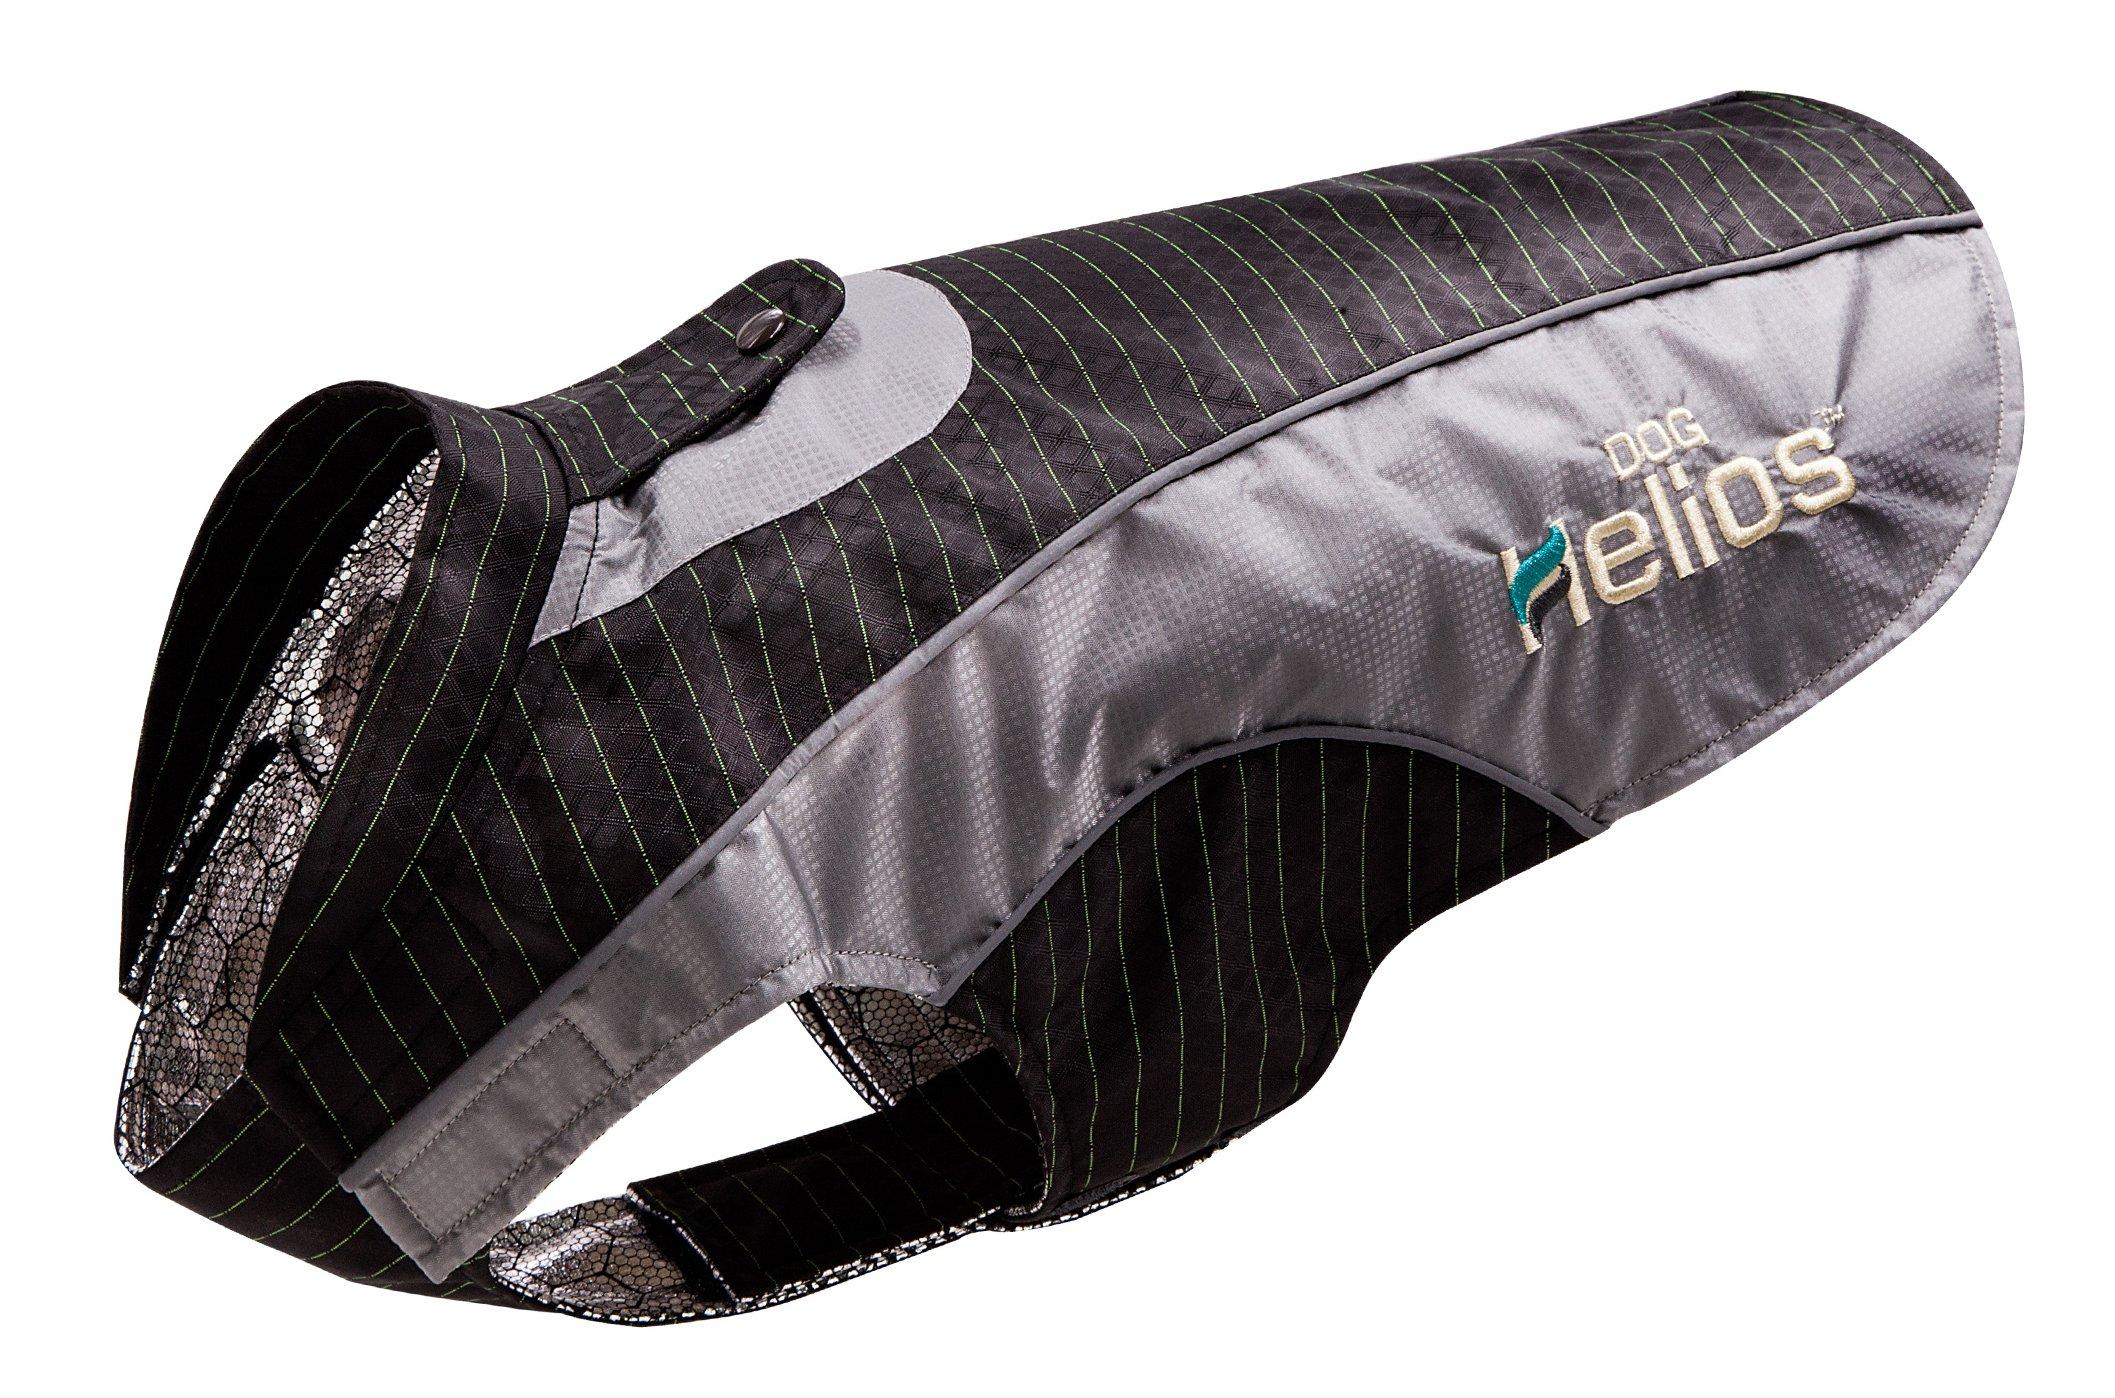 DOGHELIOS 'Reflecta-Bolt' Sporty Performance Fashion Tri-Velcro Reflective Pet Dog Coat Jacket w/ Body Heat Reflection Technology, X-Large, Black by DogHelios